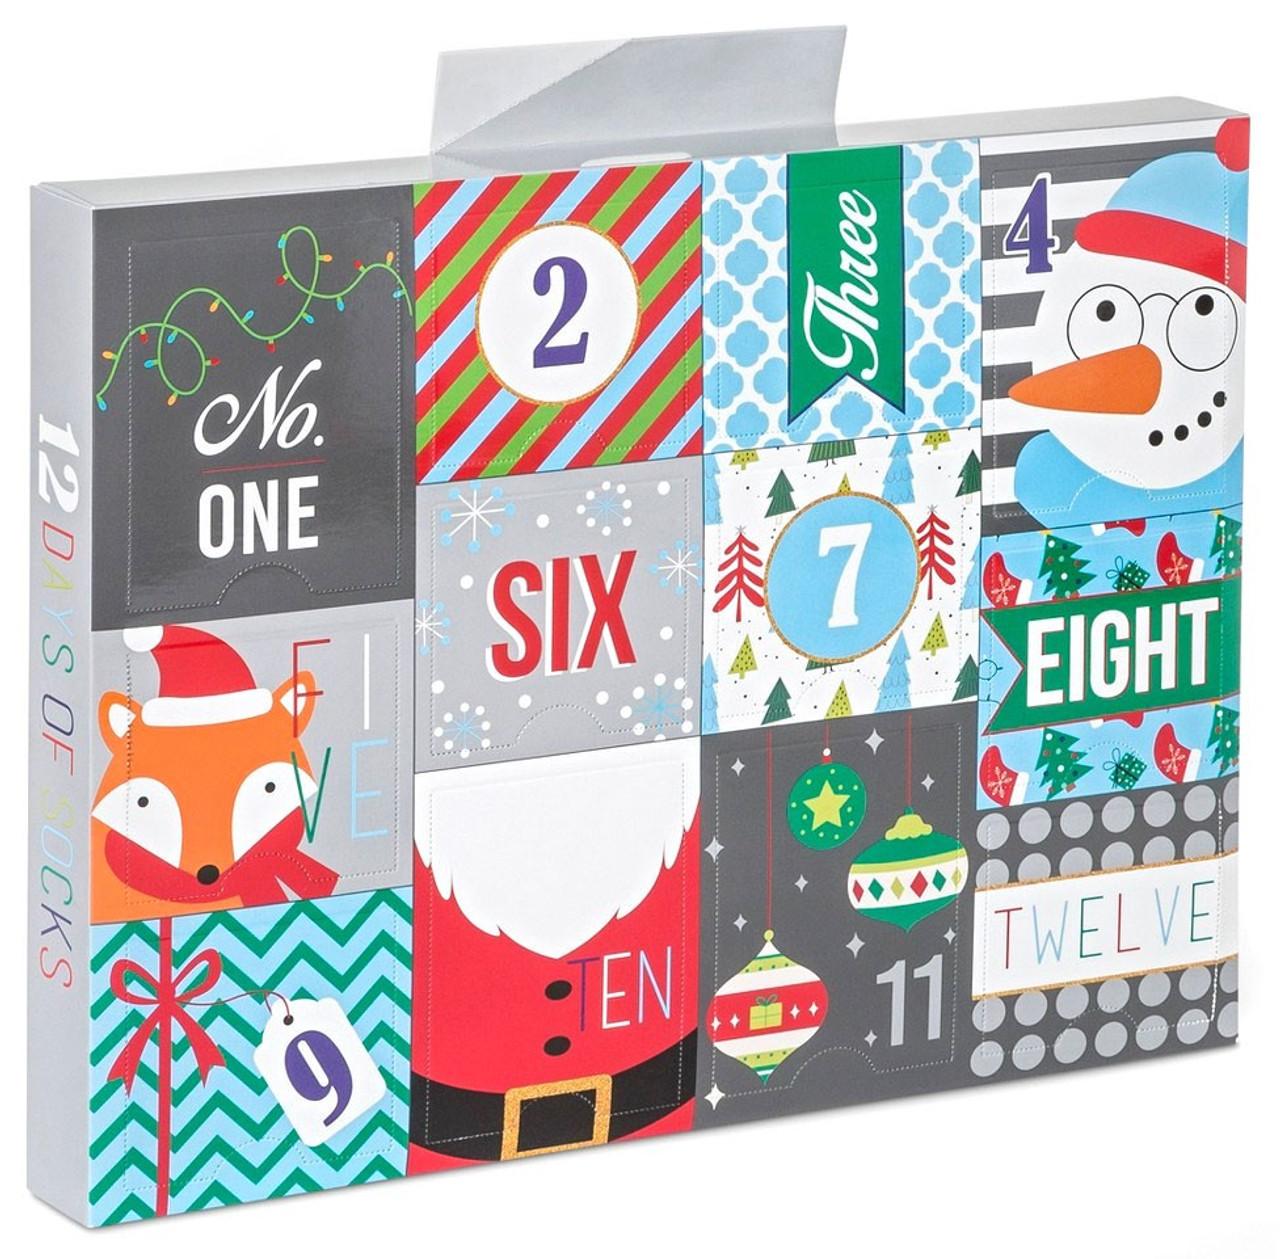 12 Days Of Christmas Socks.Boys 12 Days Of Socks 12 Pack Shoe Size 9 2 5